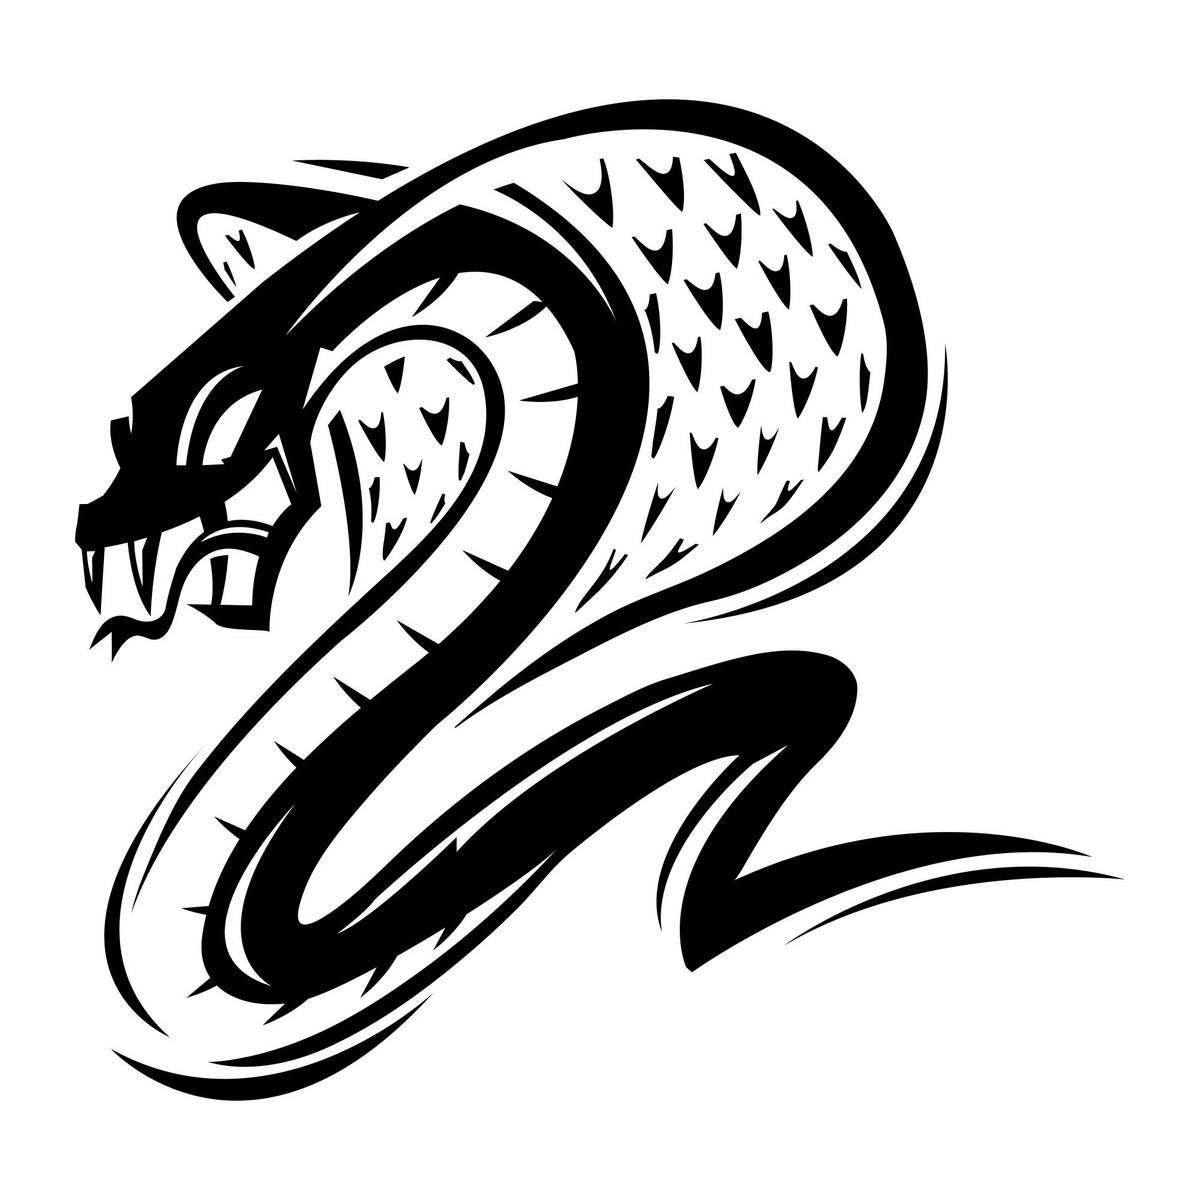 Deadly cobra snake illustration